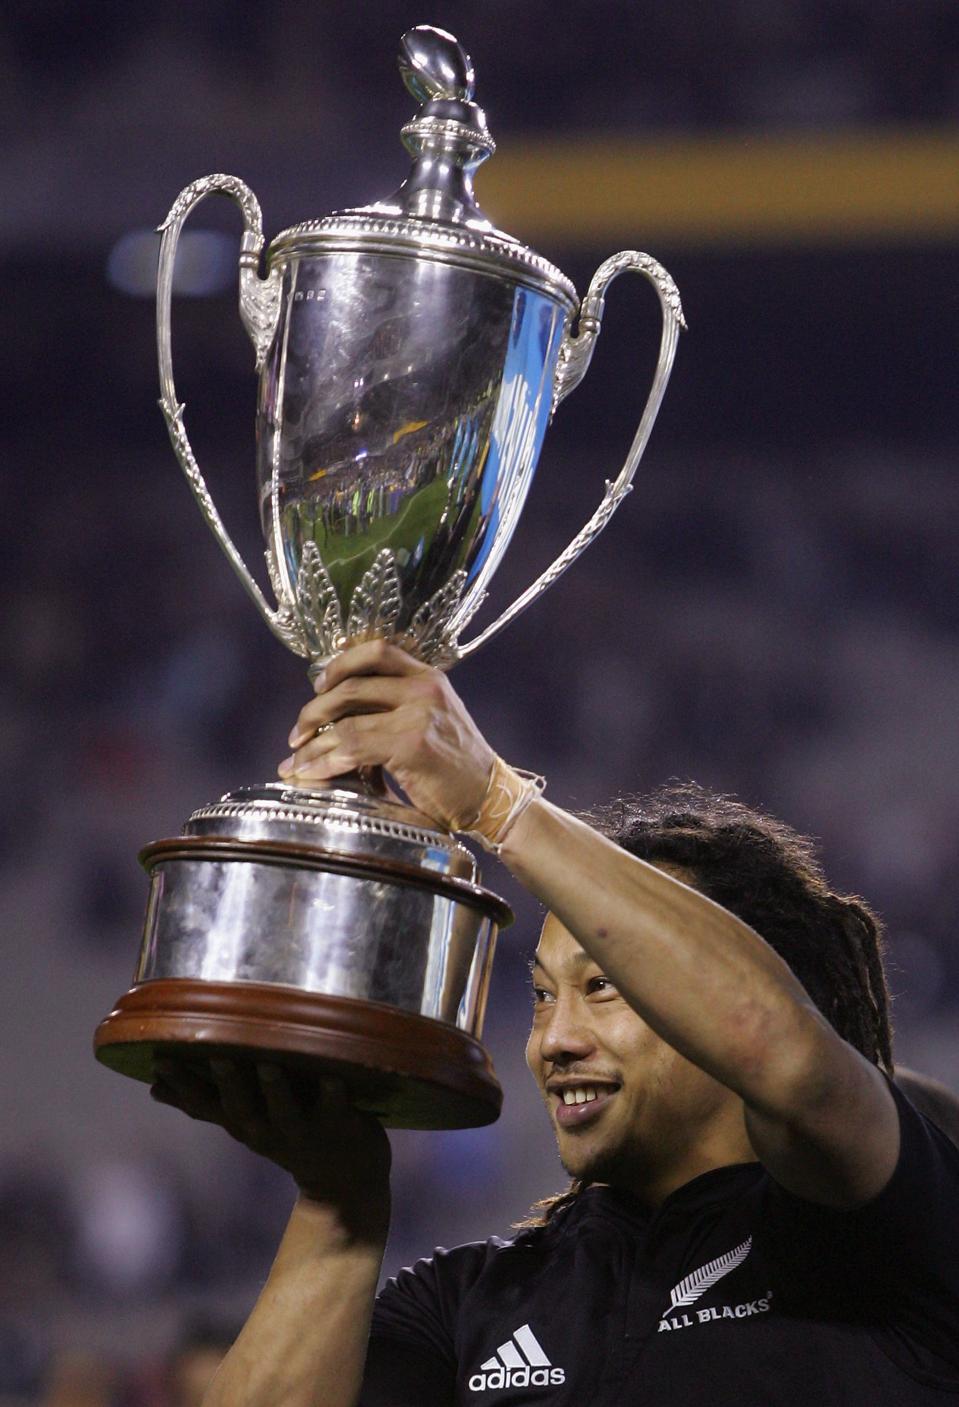 All Blacks captain Tana Umaga holds aloft the Tri-Nations Cup.